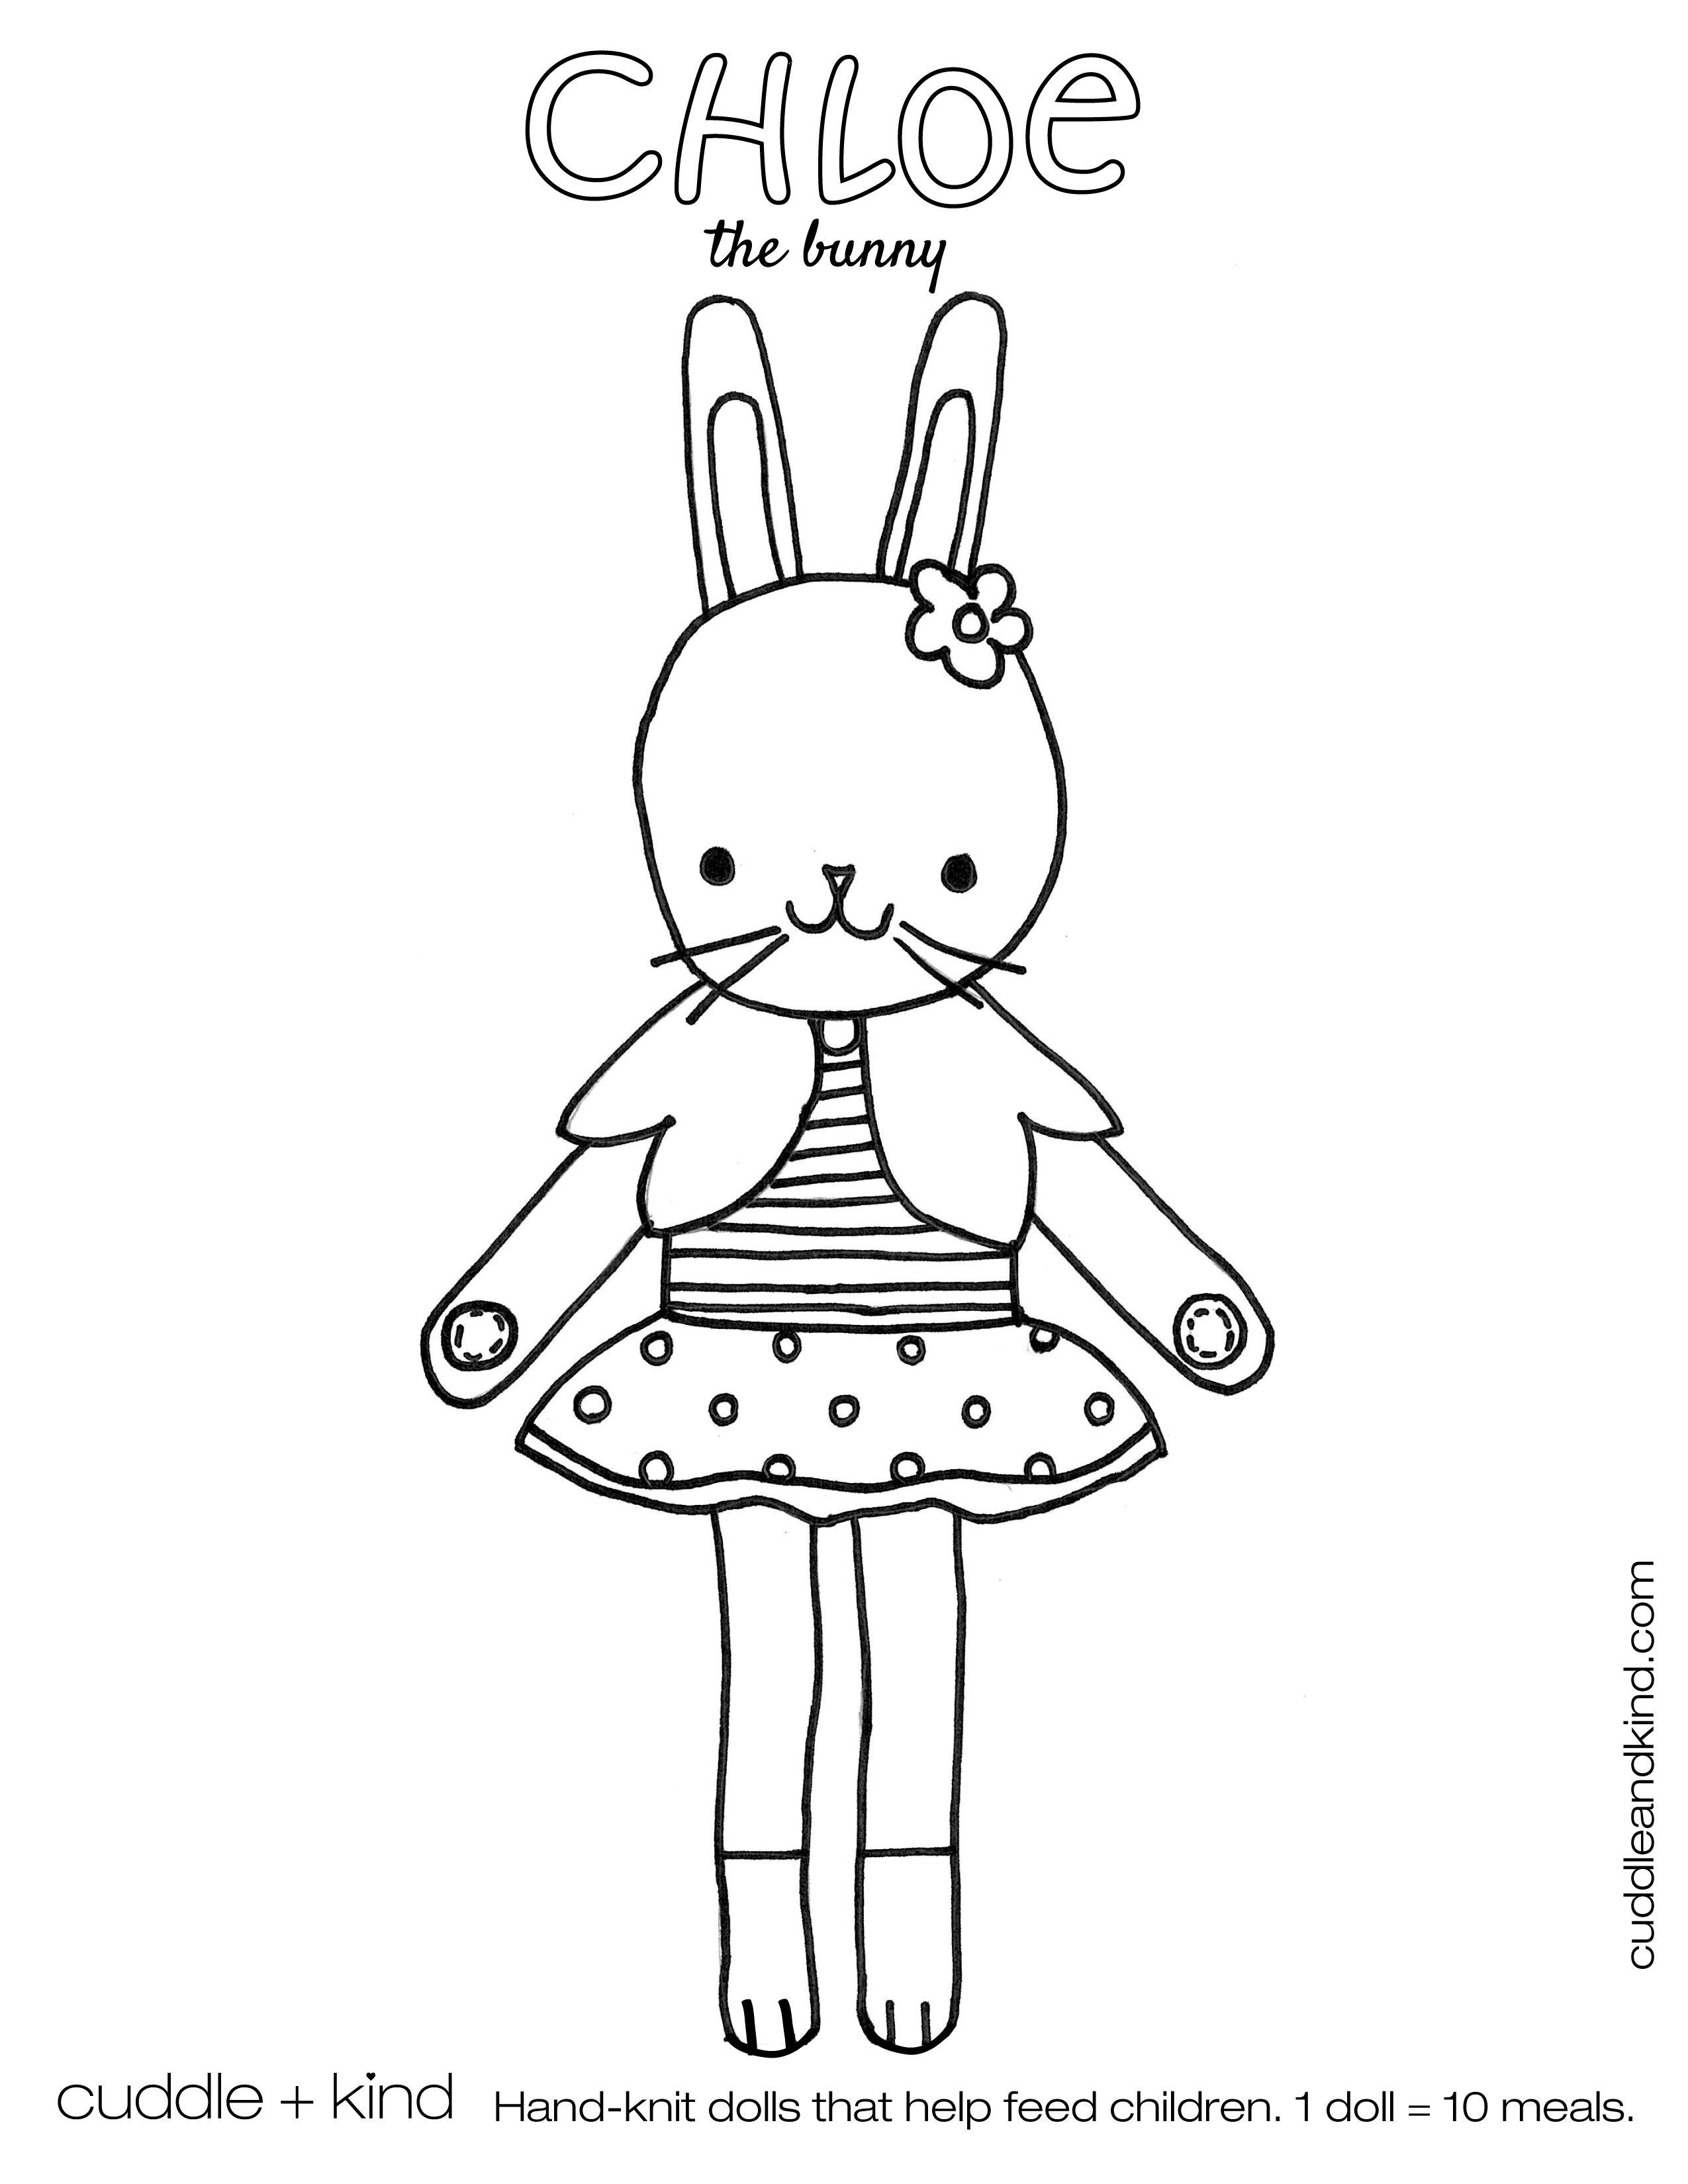 Cuddle Kind Chloe The Bunny Colouring Sheet Ddleandkind